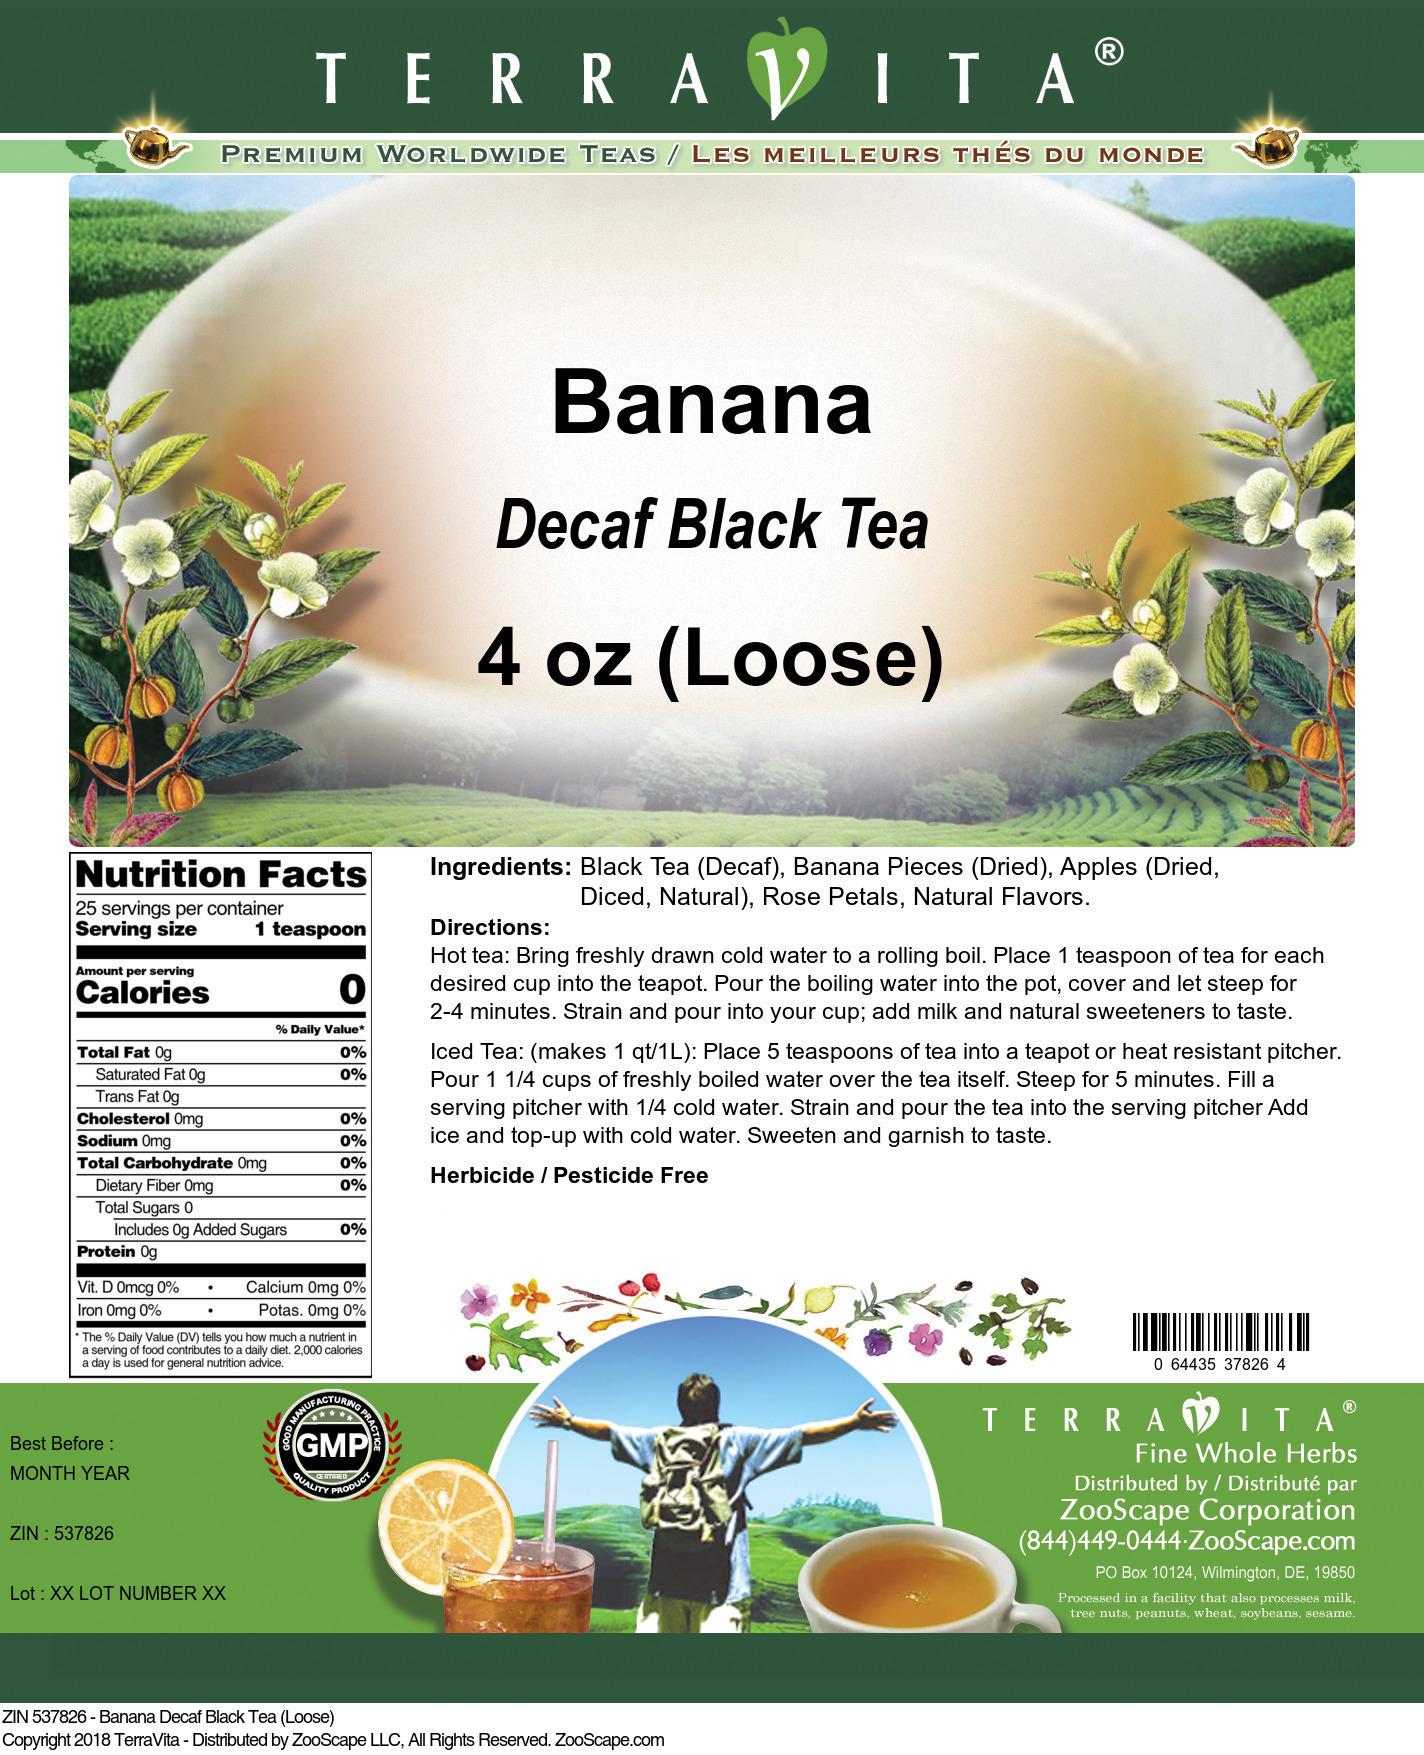 Banana Decaf Black Tea (Loose)